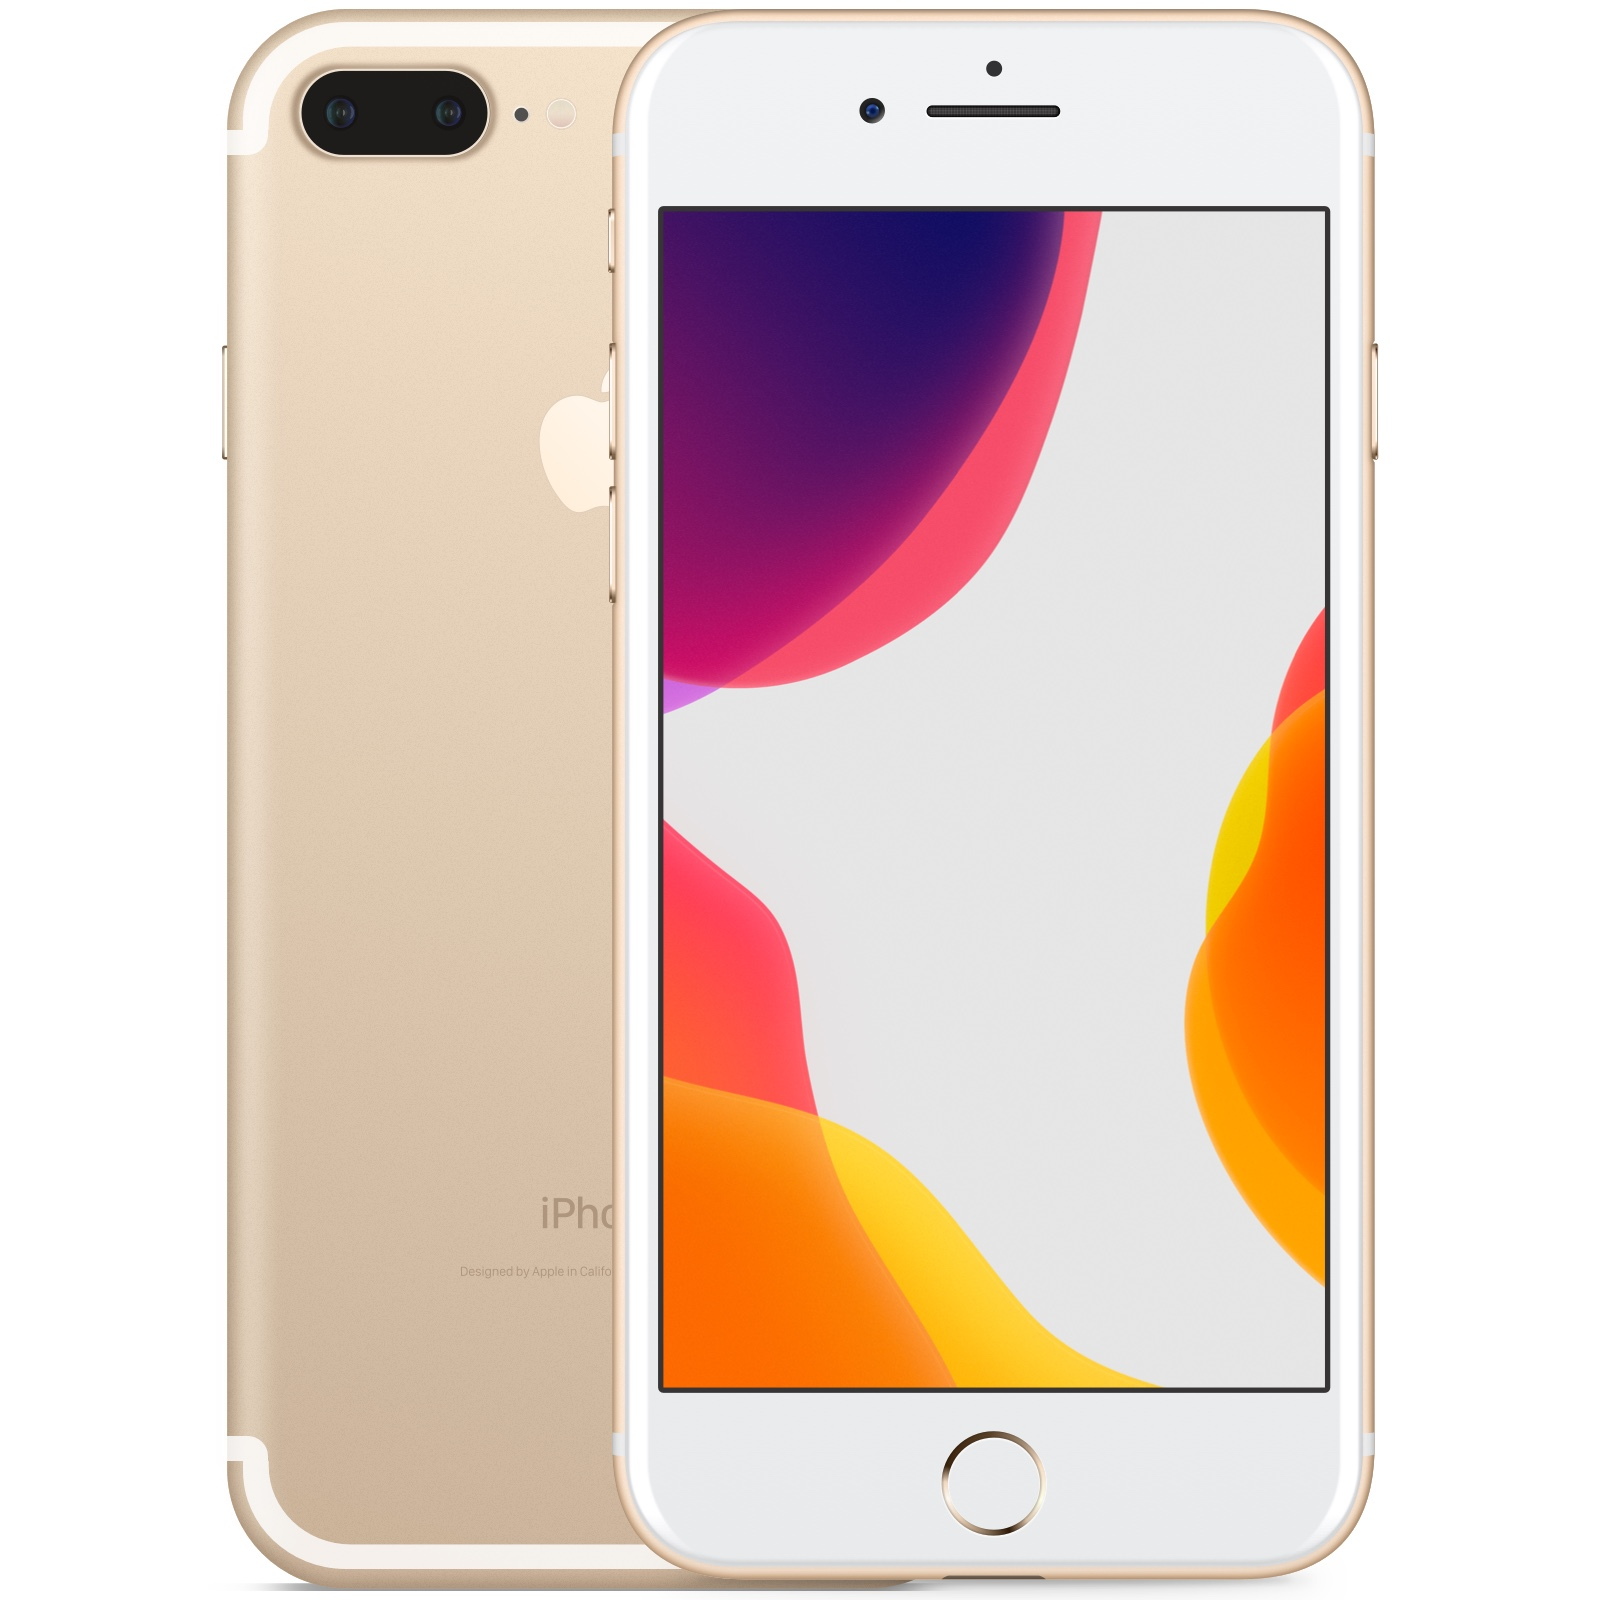 iPhone7Plus256GB-kulta-2-9.jpg